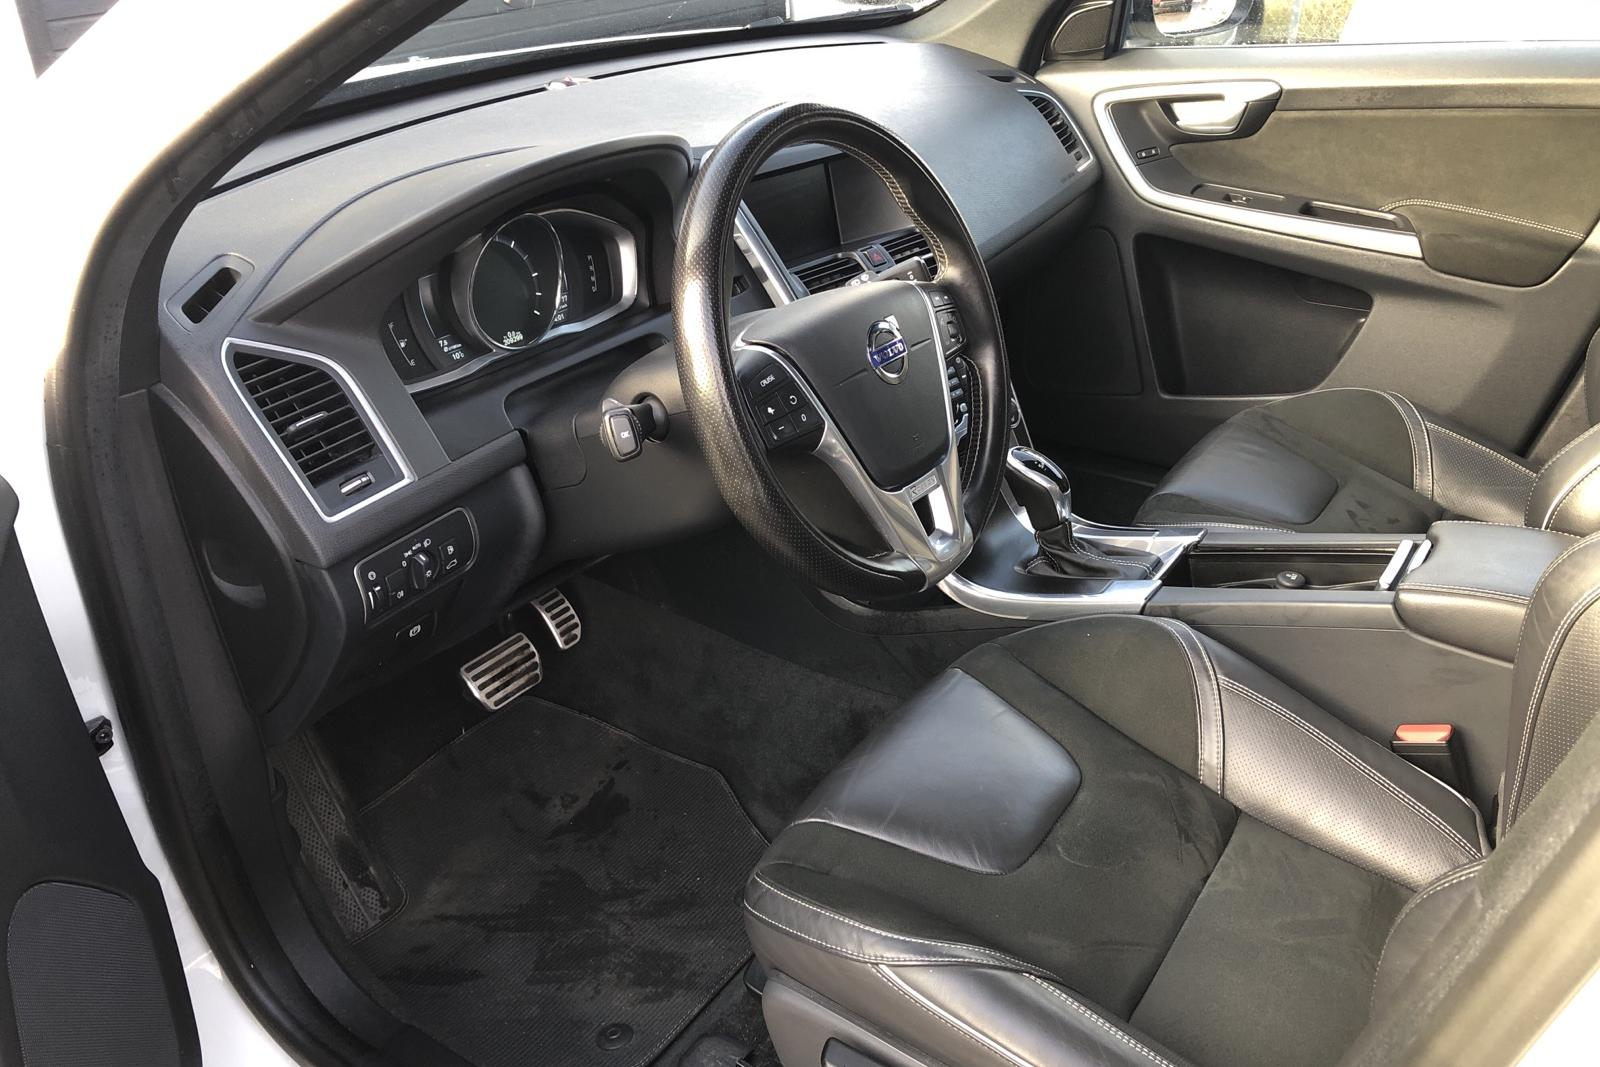 Volvo XC60 D4 AWD (190hk) - 209 290 km - Automatic - white - 2016